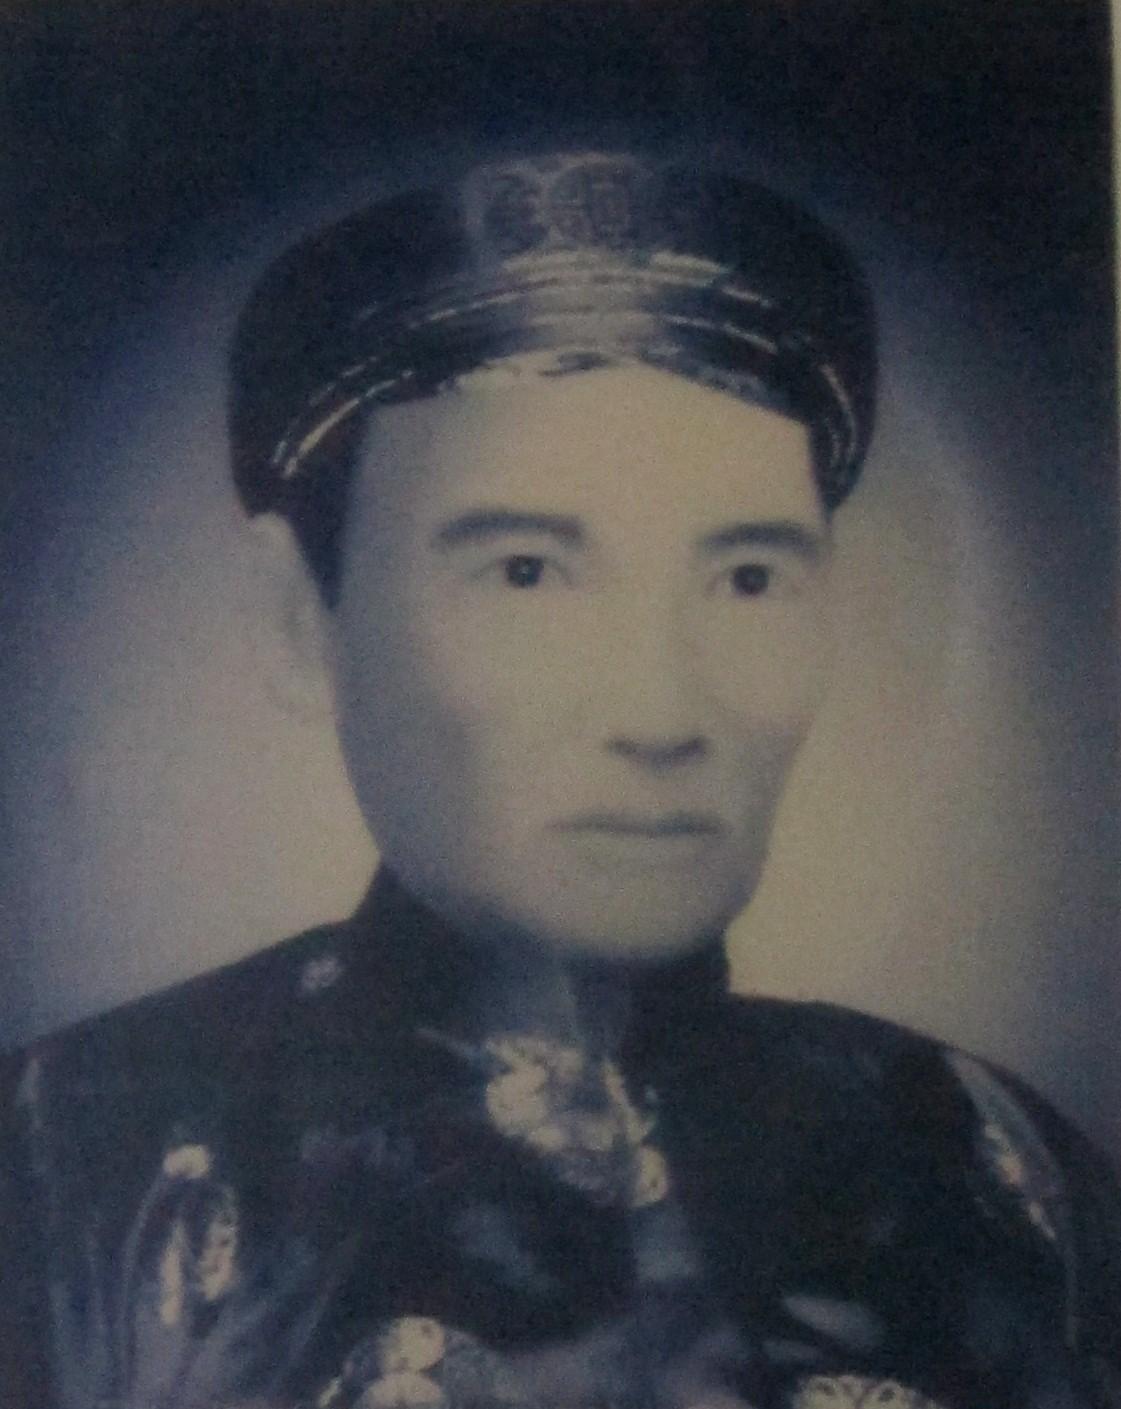 h1-chan-dung-ong-pham-cao-cham-1872-1918-1621325128-1633331677.jpg